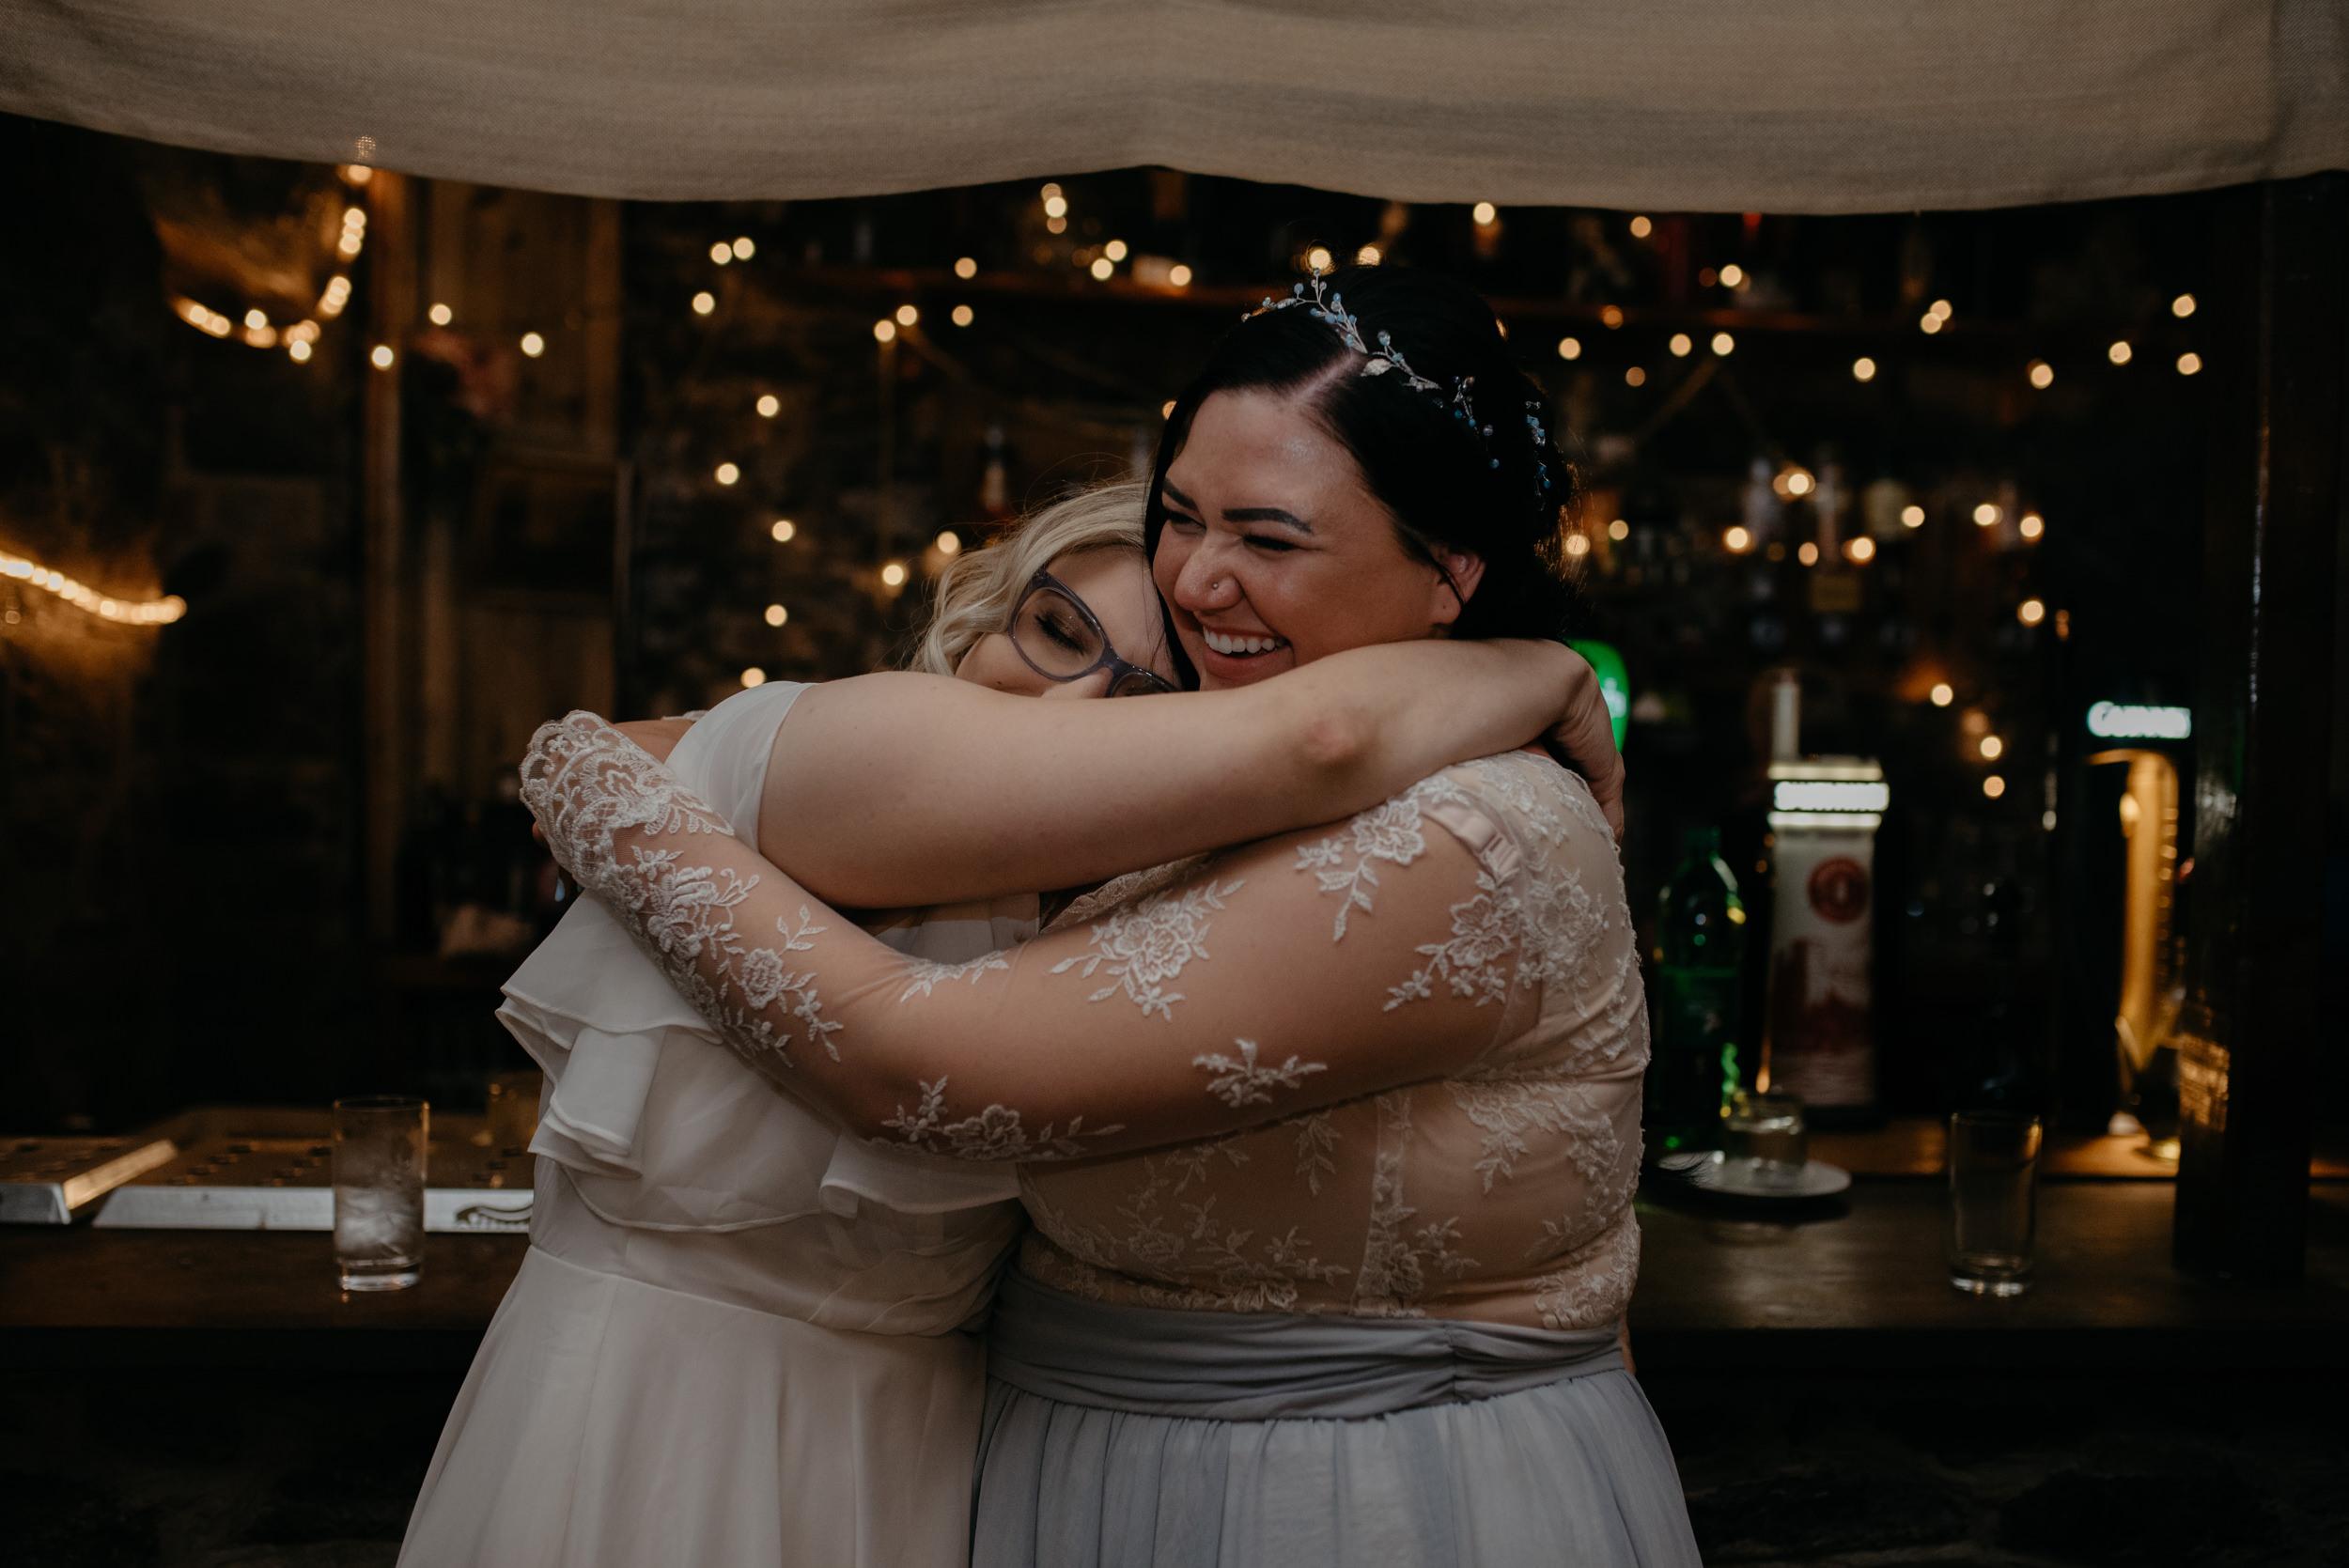 Wedding Reception at Vaughn's Pub in Kilfenora. County Clare, Ireland wedding and elopement photographer.